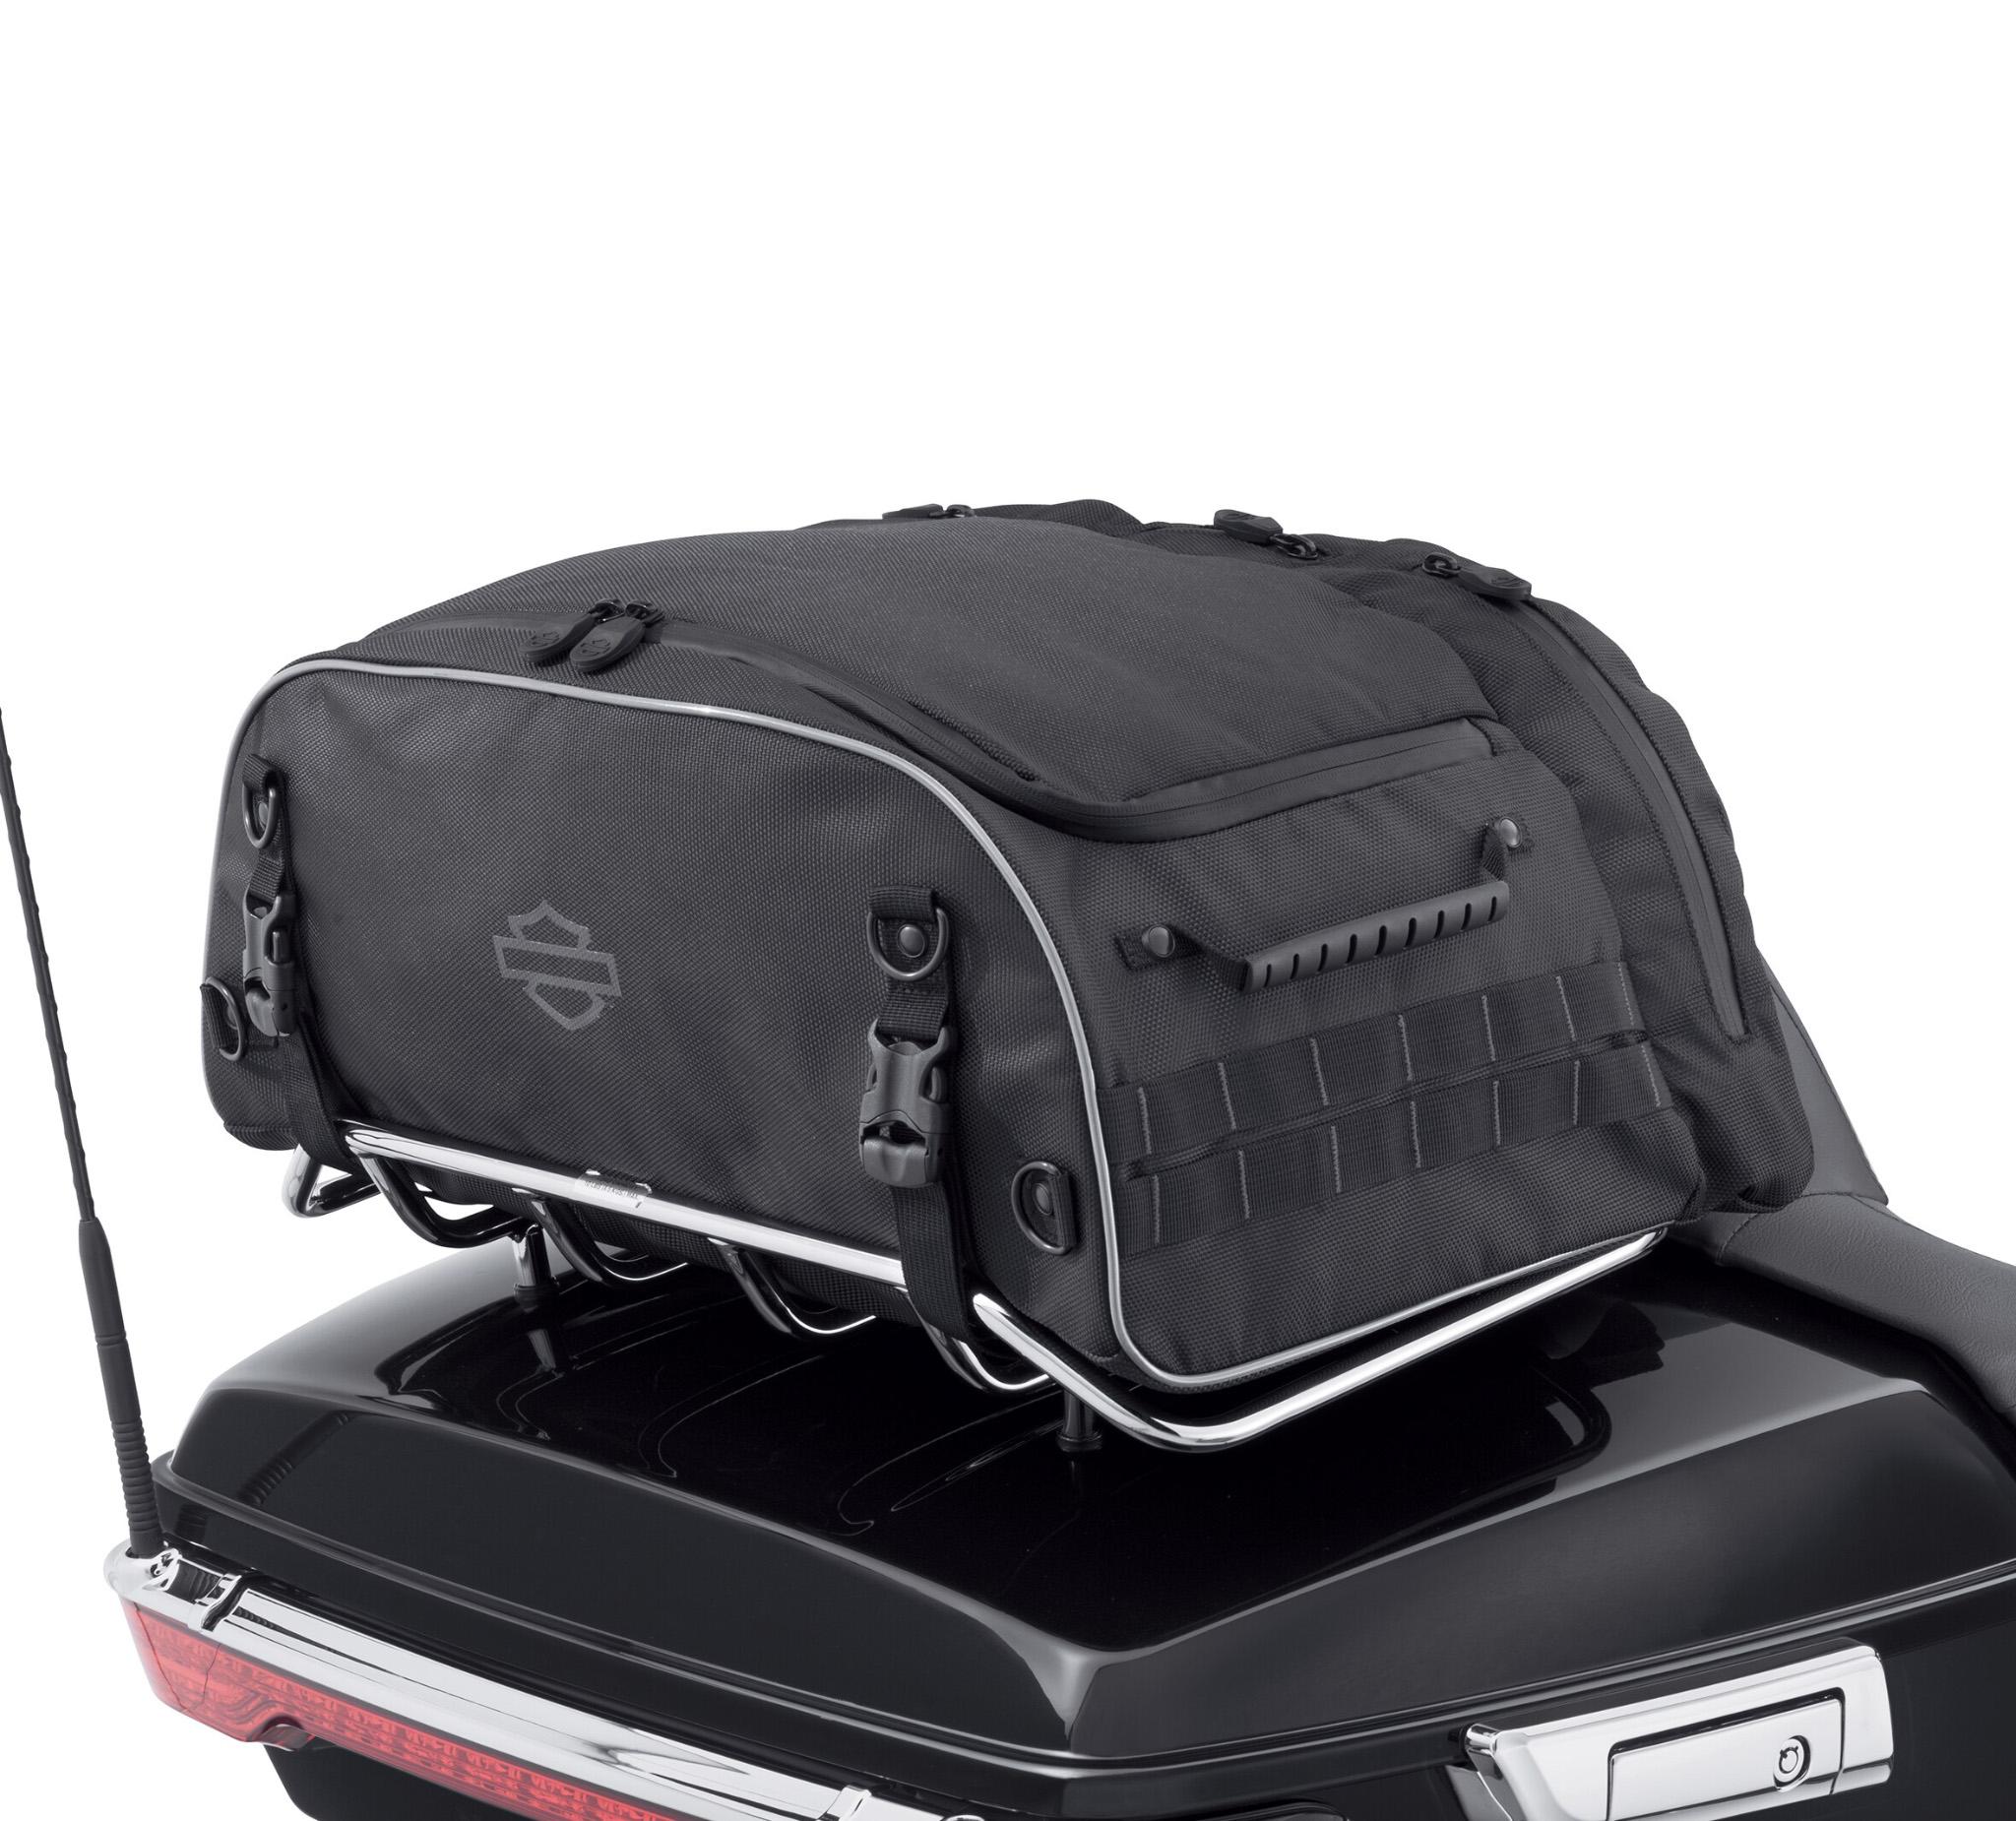 onyx premium luggage collapsible tour pak rack bag